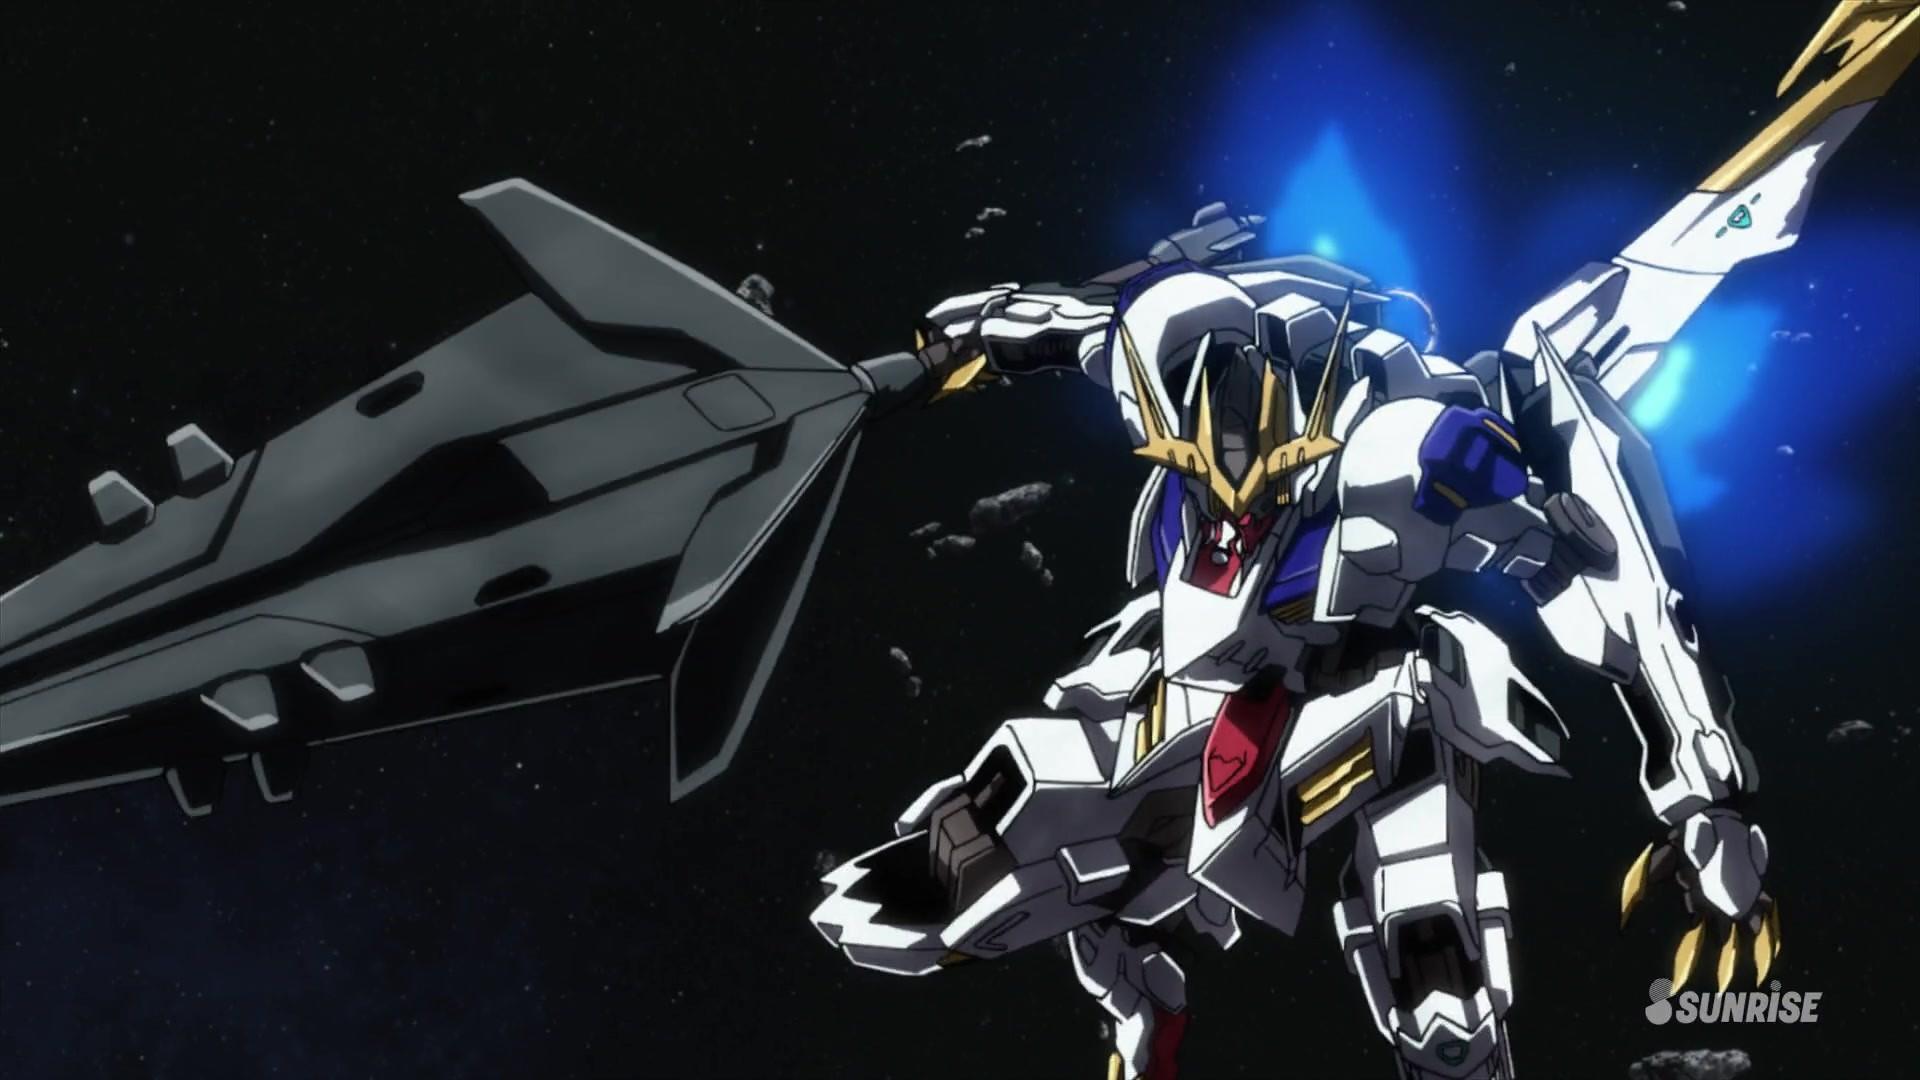 ASW-G-08 Gundam Barbatos Lupus Rex (Episode 42).jpg | The Gundam Wiki |  FANDOM powered by Wikia